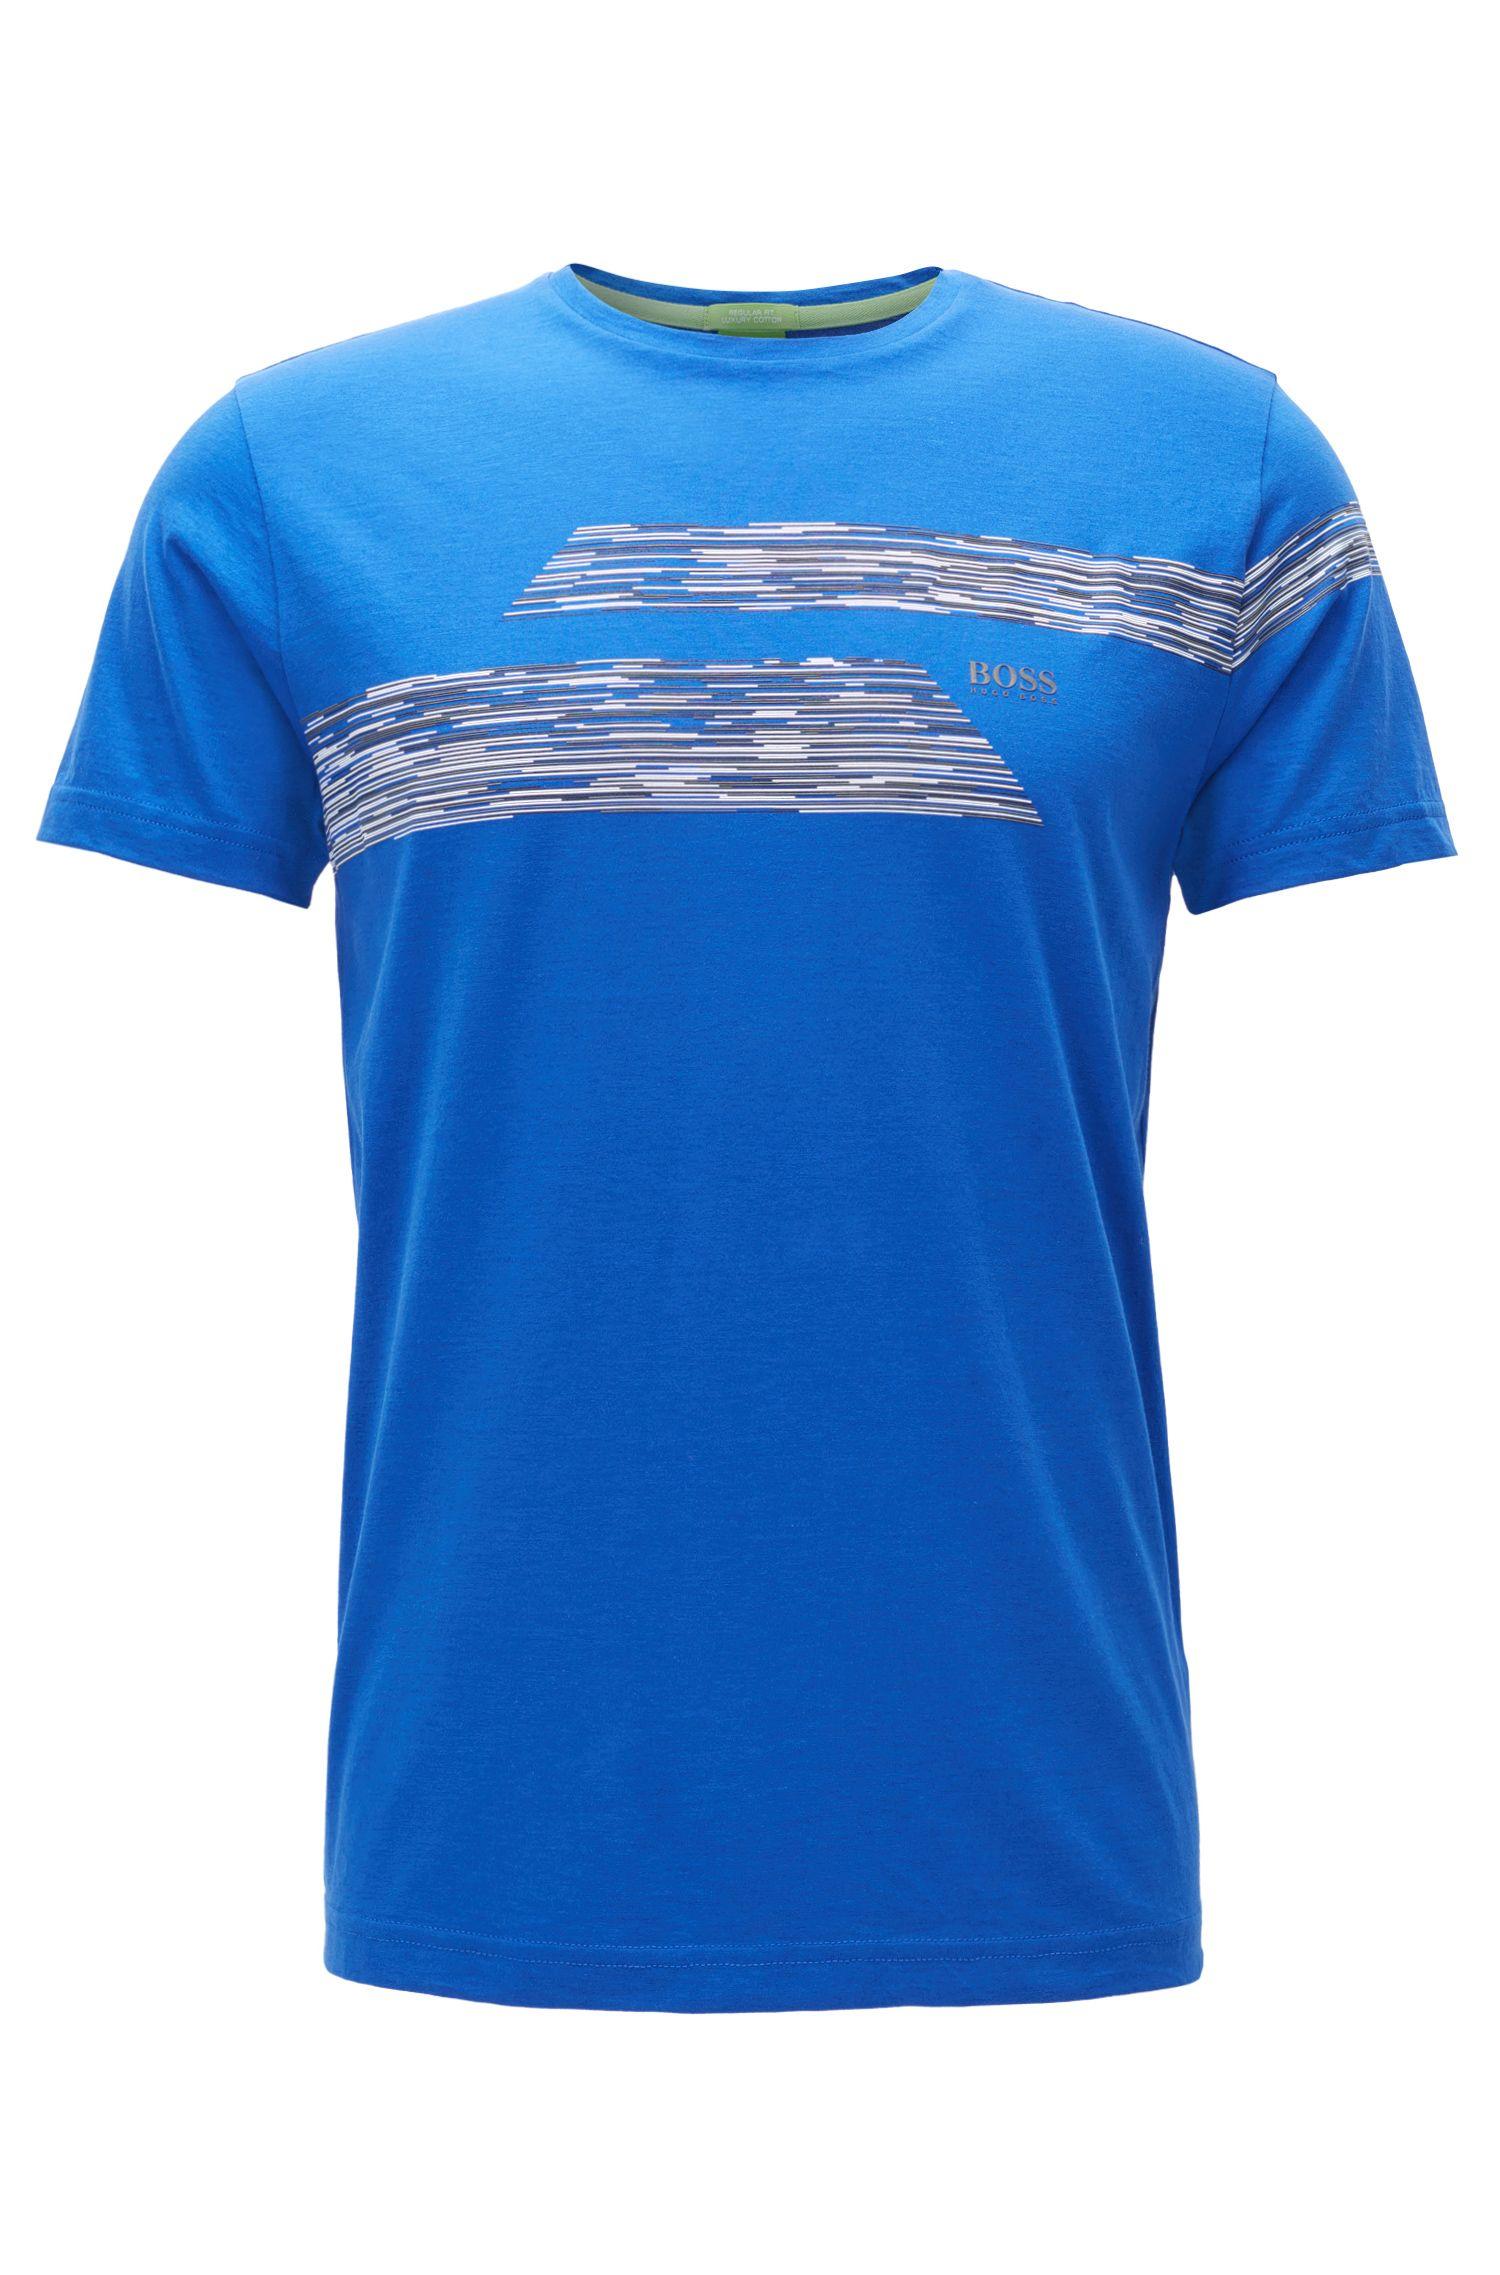 Graphic T-Shirt   Teep, Blue